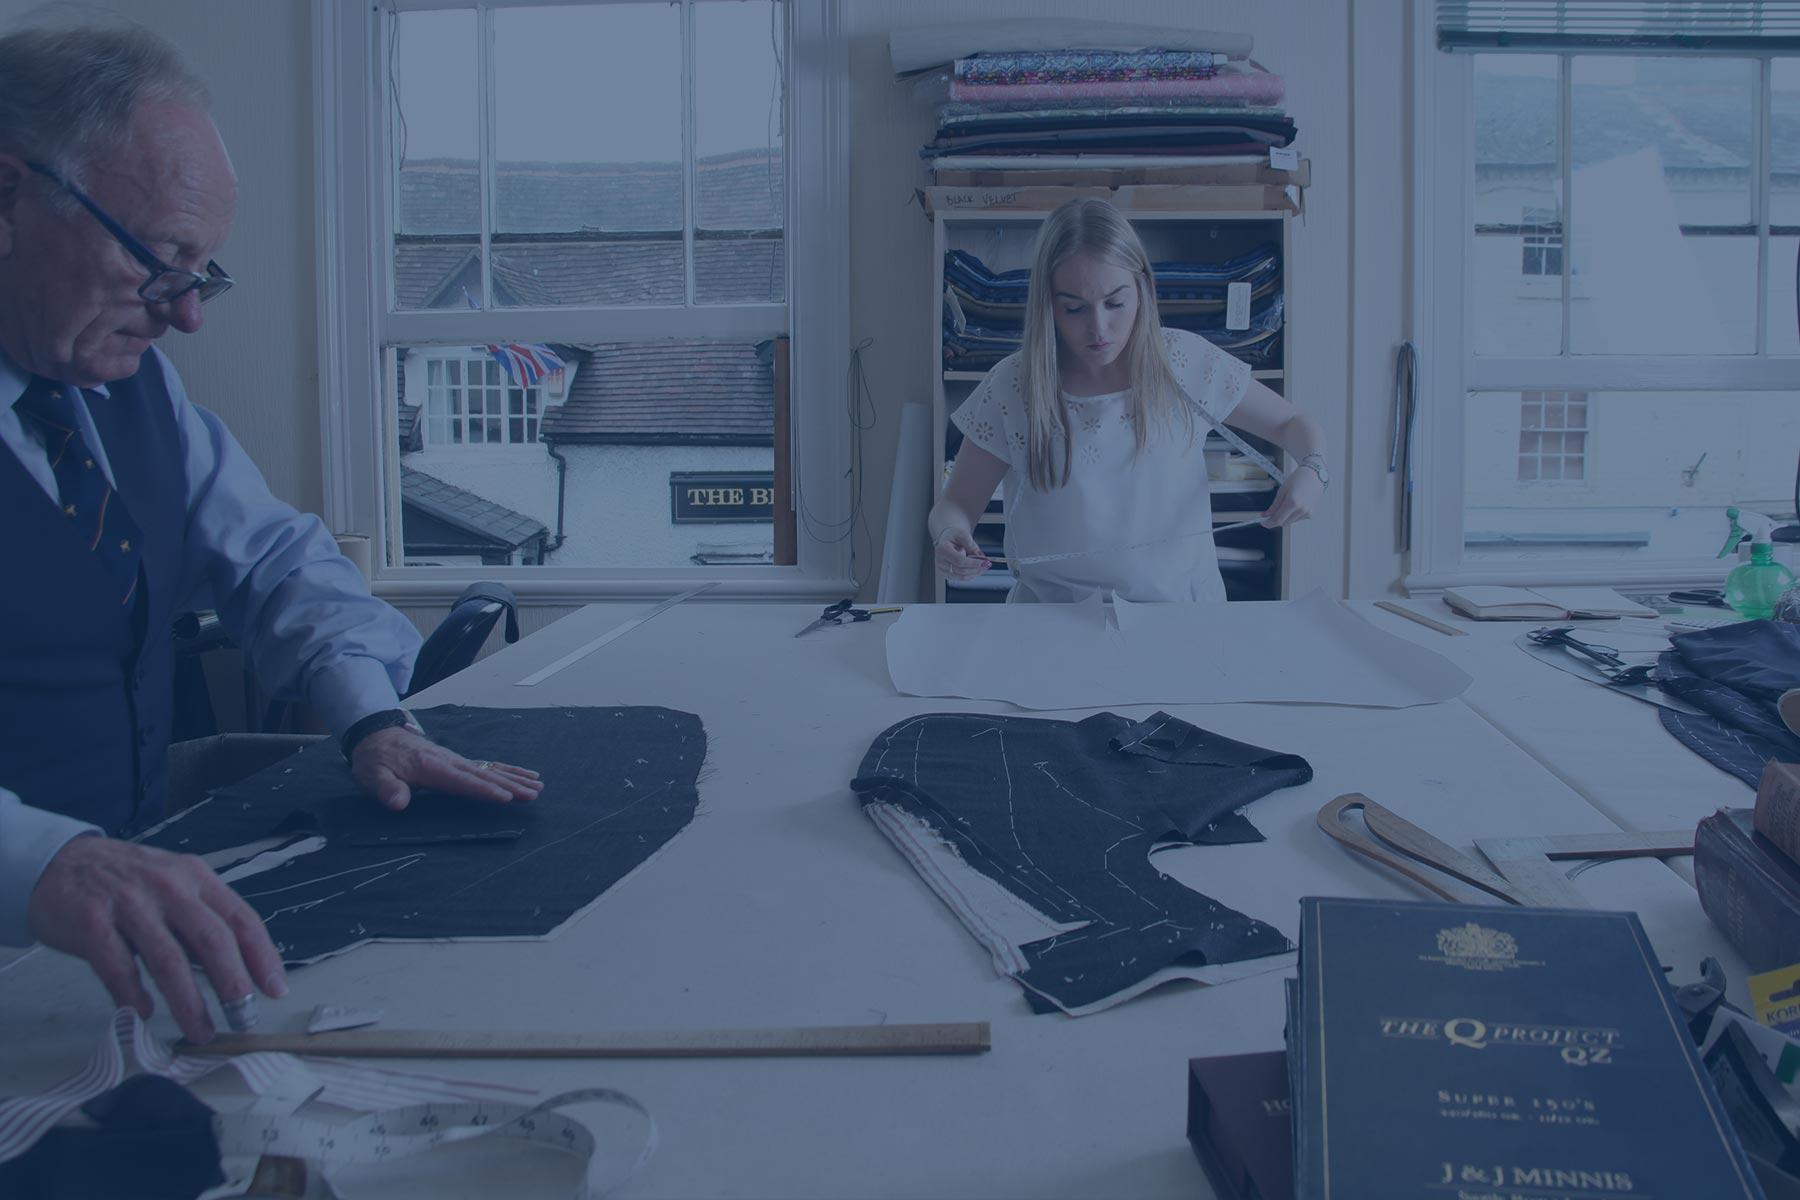 Traditional & bespoke English tailors - —